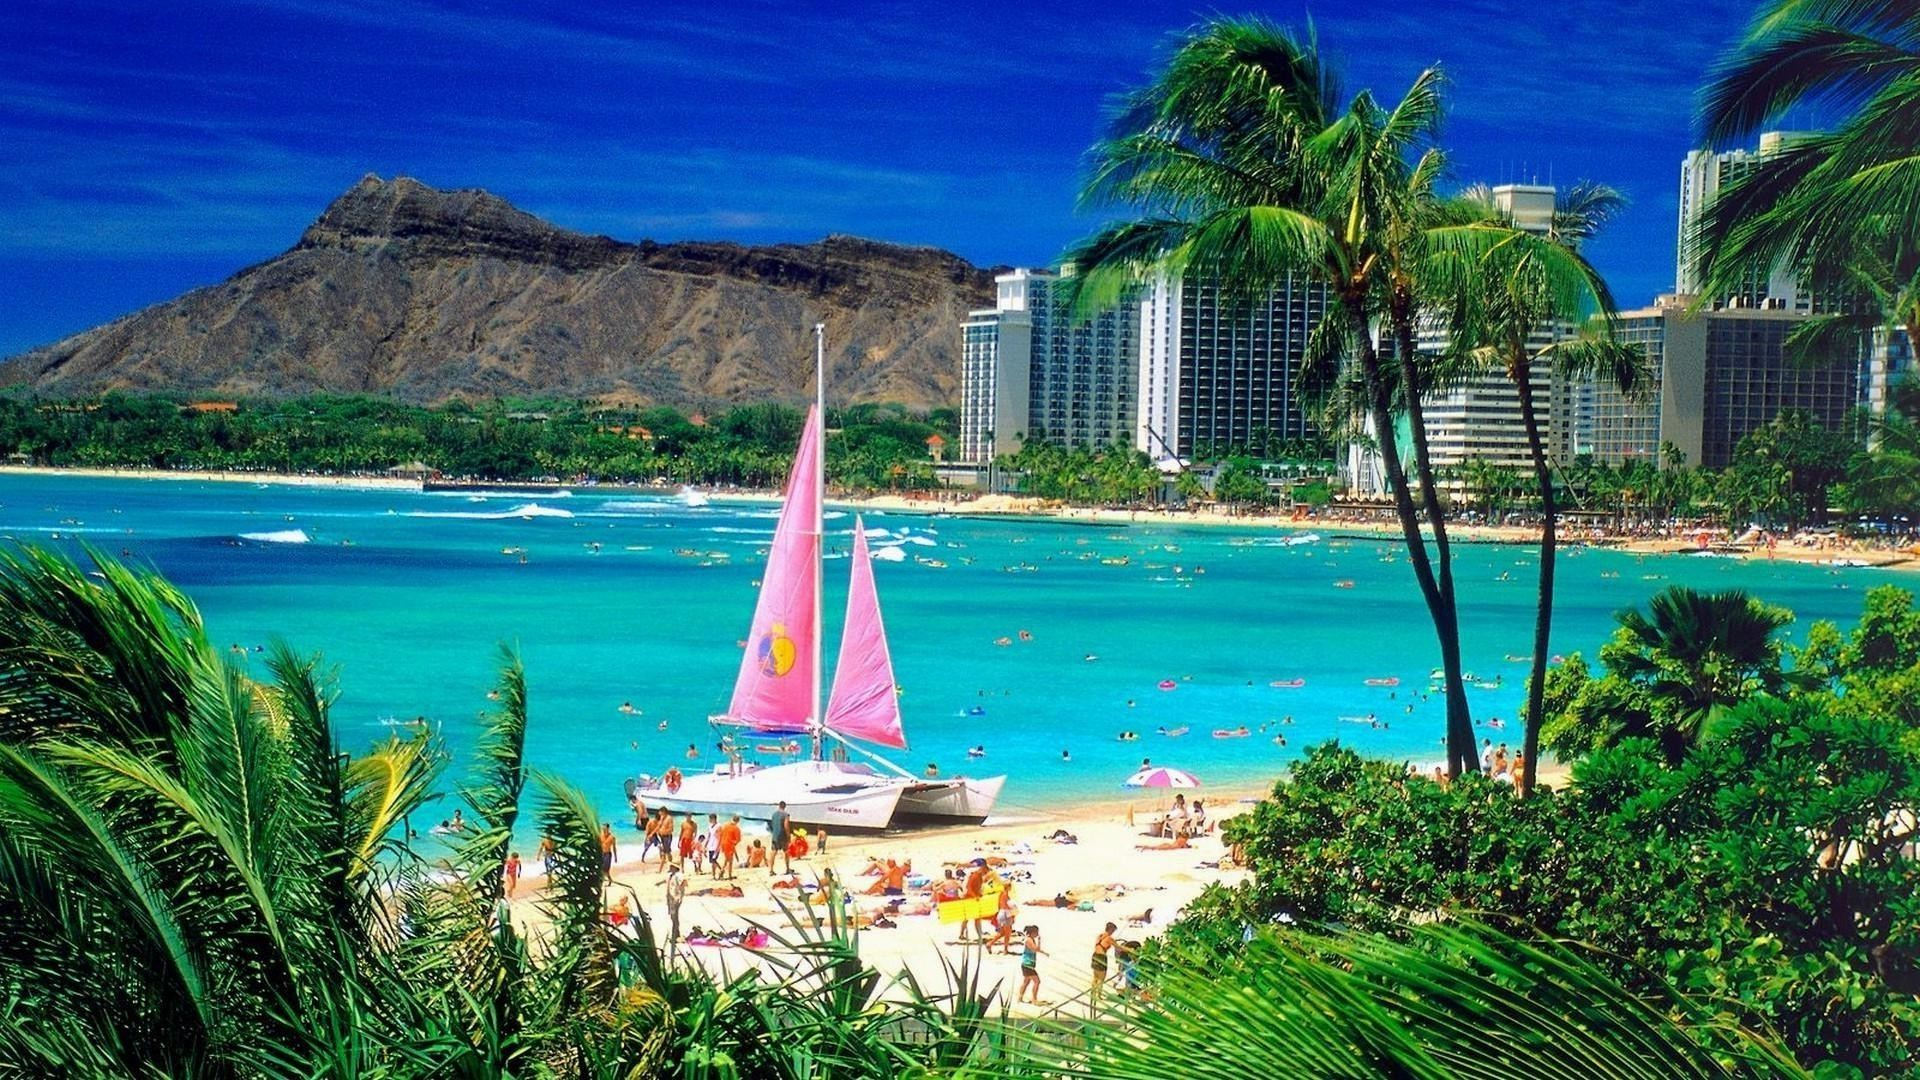 Waikiki-honolulu-hawaii-wide-wallpaper-hd